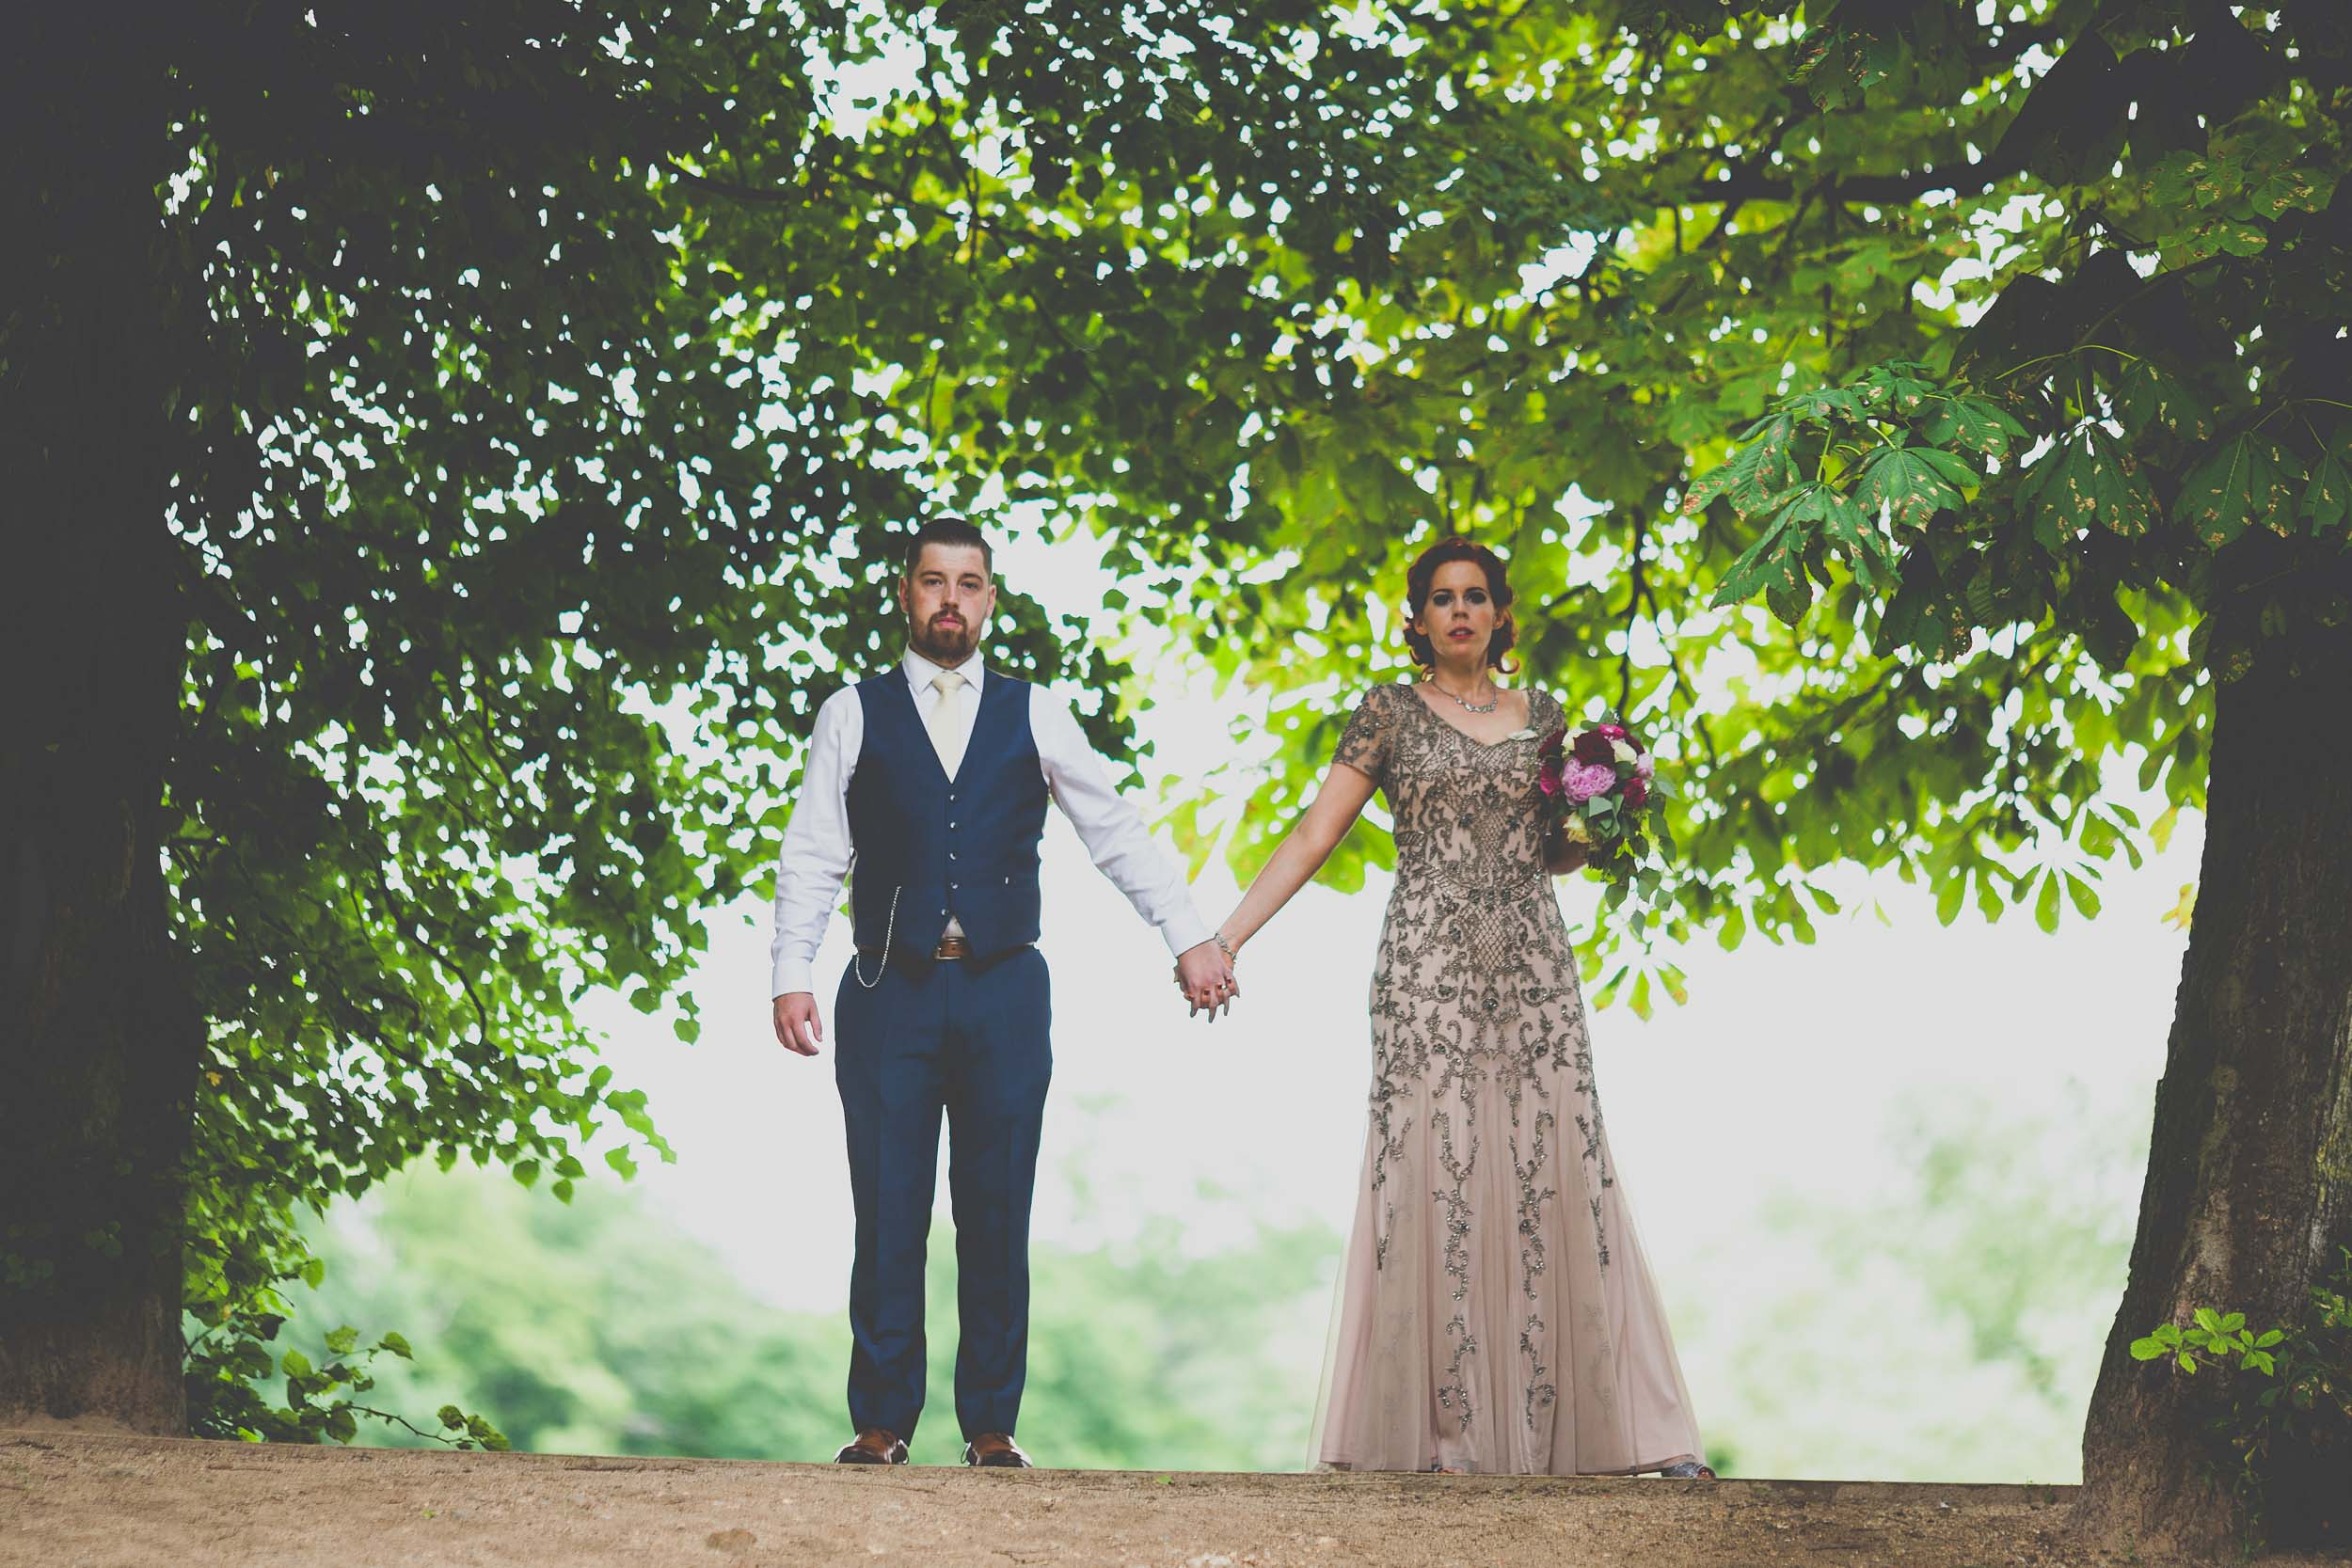 queen-elizabeths-hunting-lodge-epping-forest-wedding263.jpg